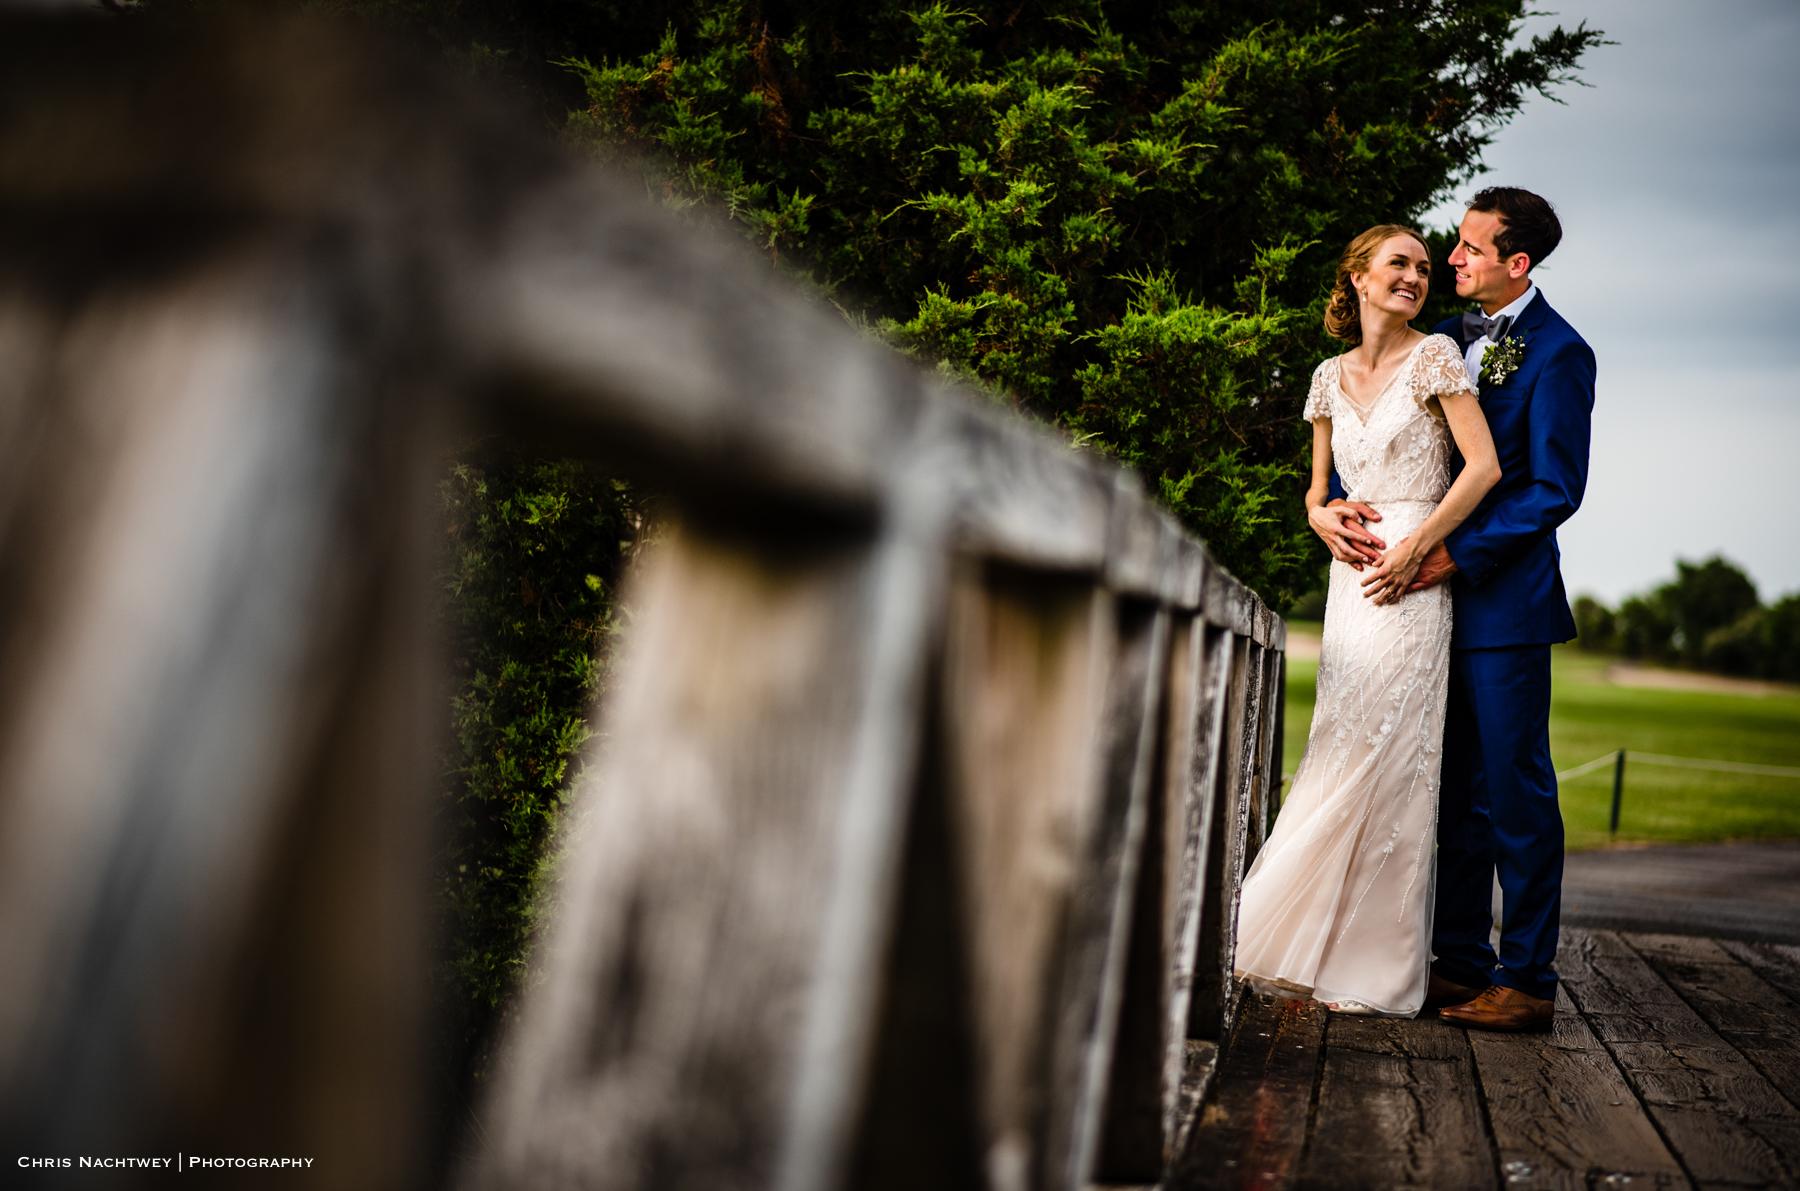 photos-wedding-quidnessett-country-club-ri-chris-nachtwey-photography-2018-40.jpg